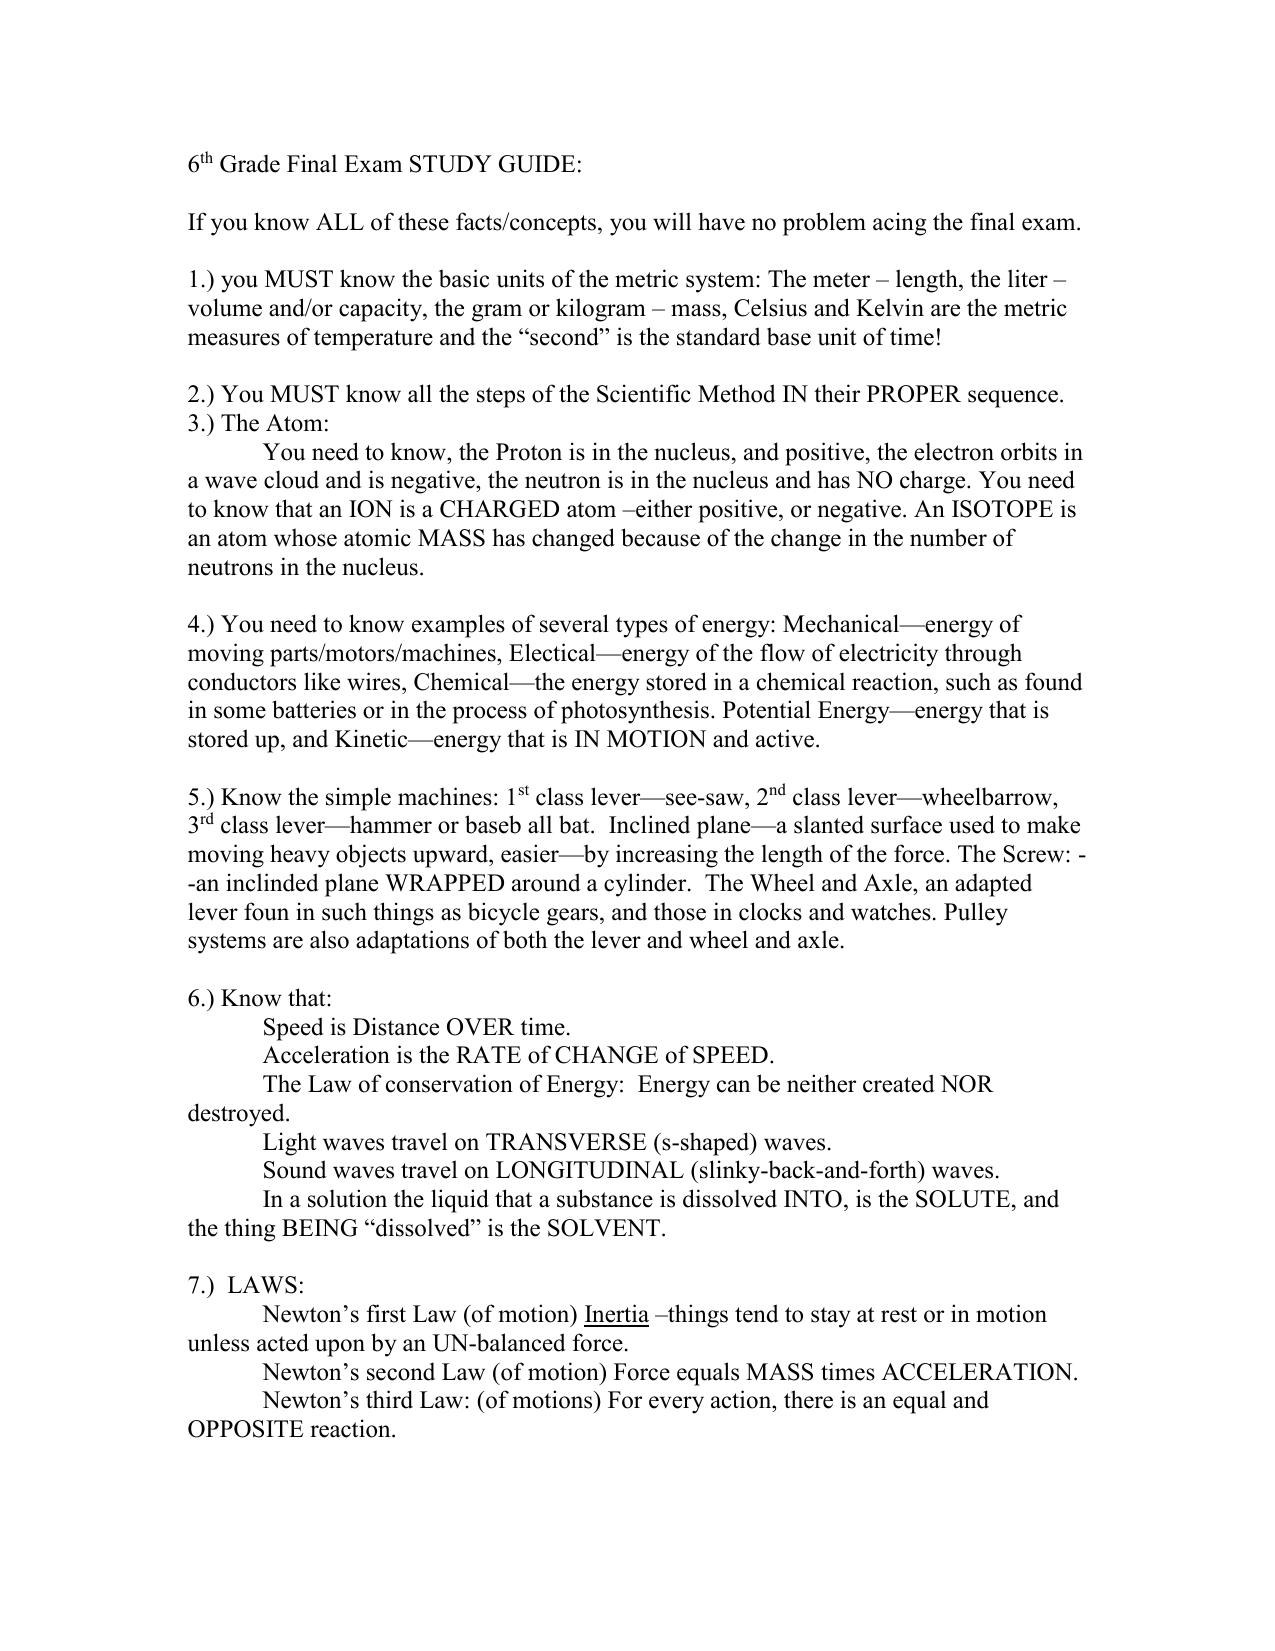 worksheet Celsius To Kelvin Worksheet pulleys and gears worksheets grade 4 lesson plan in science workbooks for grade